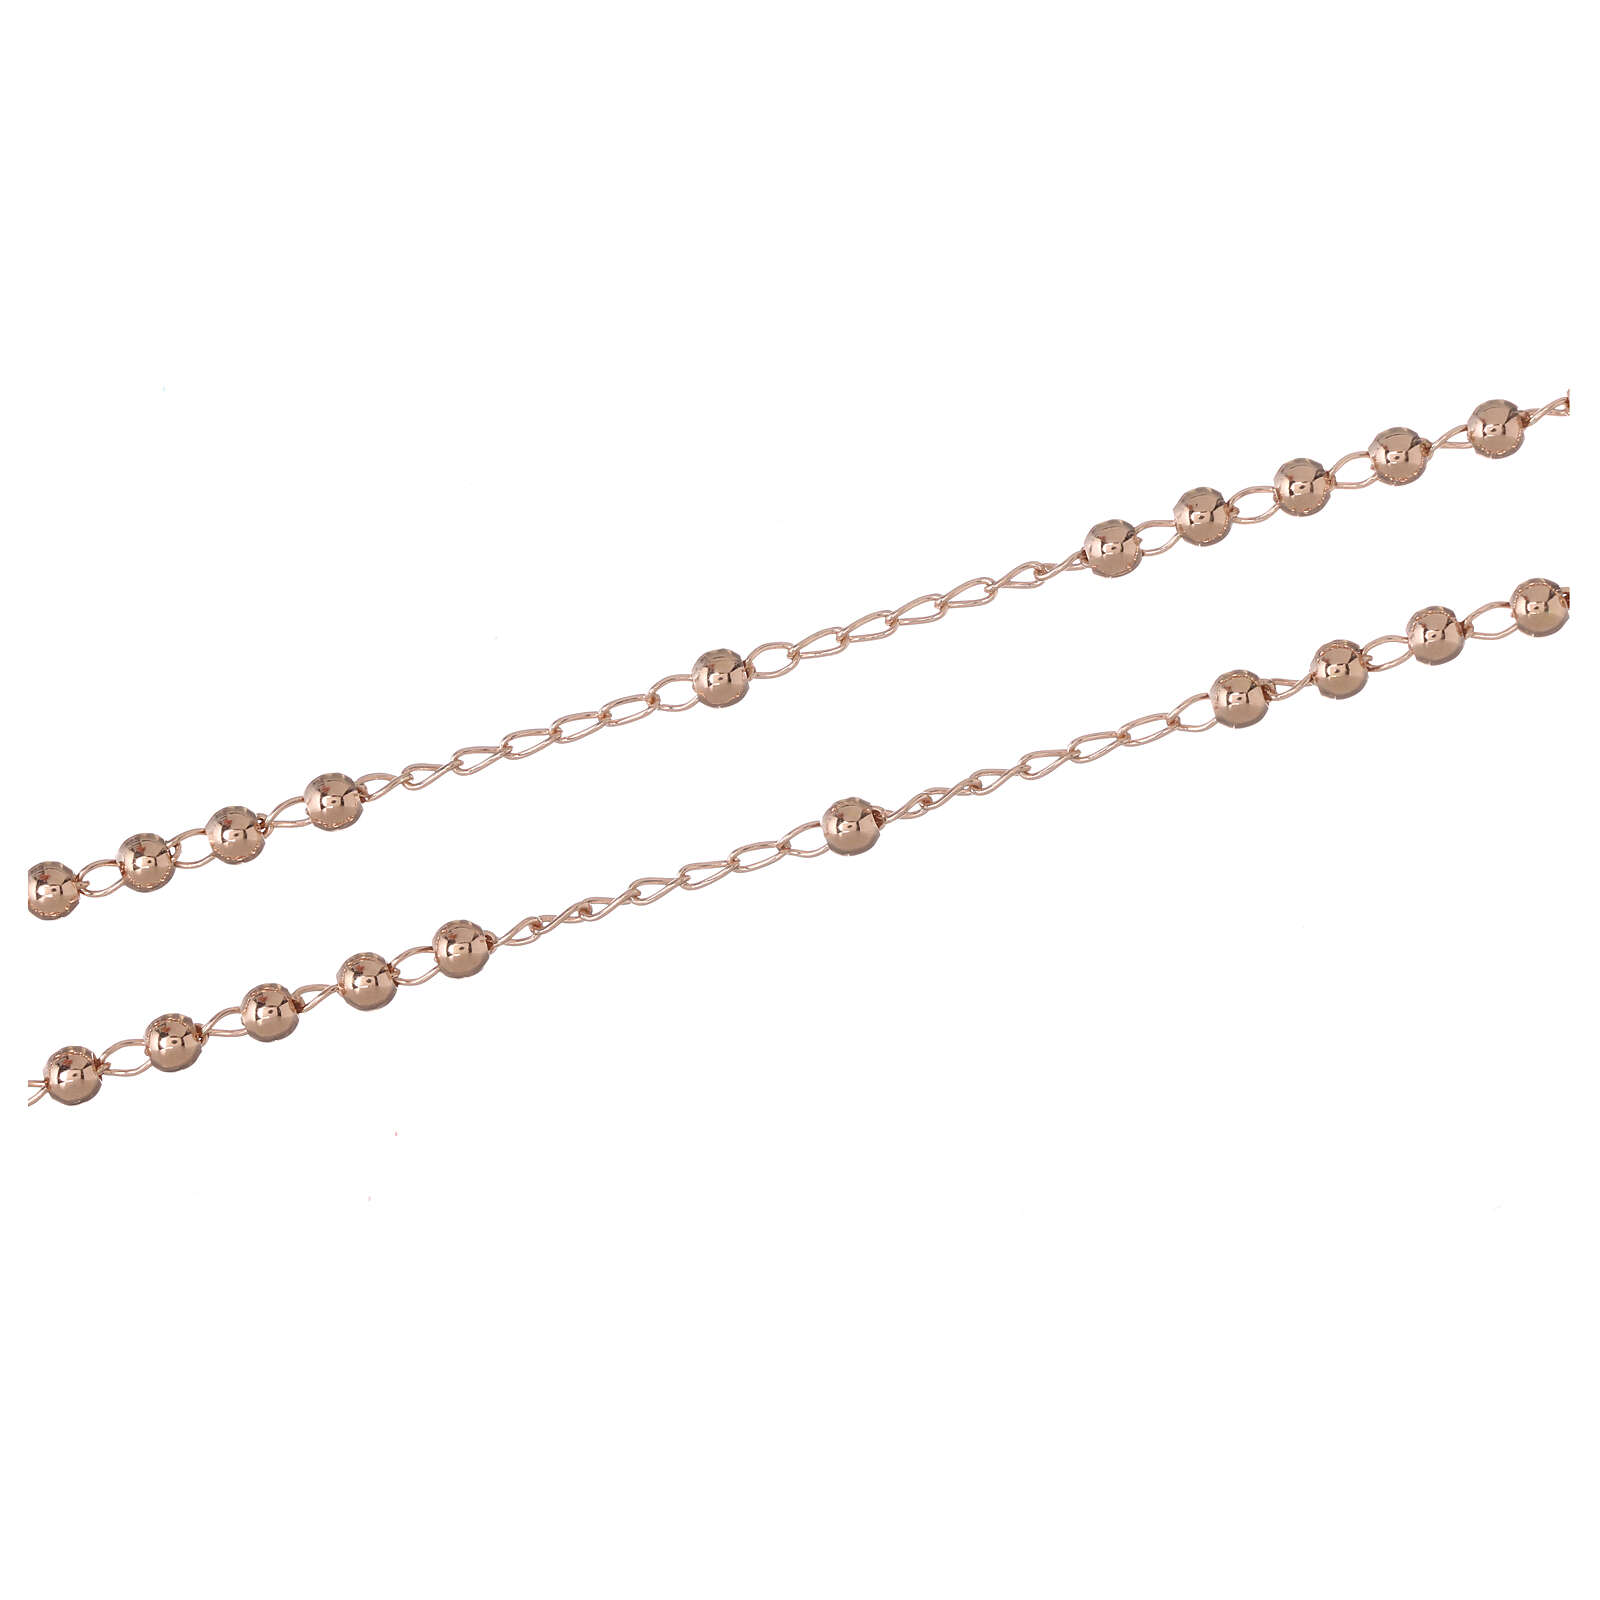 Rosary Necklace AMEN classic 3mm silver 925, Rosè finish 4